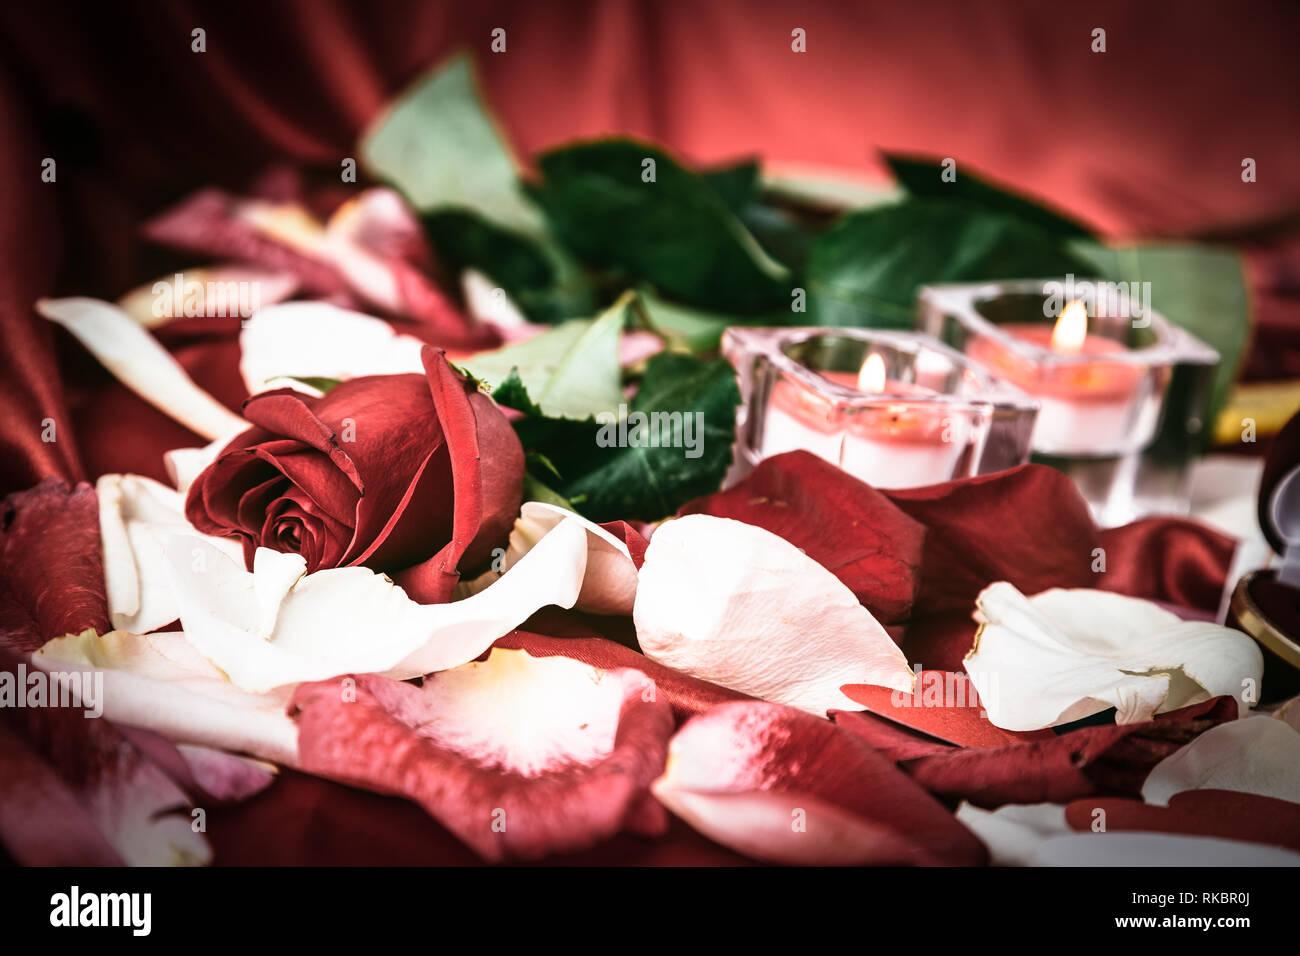 Burning Rose Stock Photos & Burning Rose Stock Images - Page